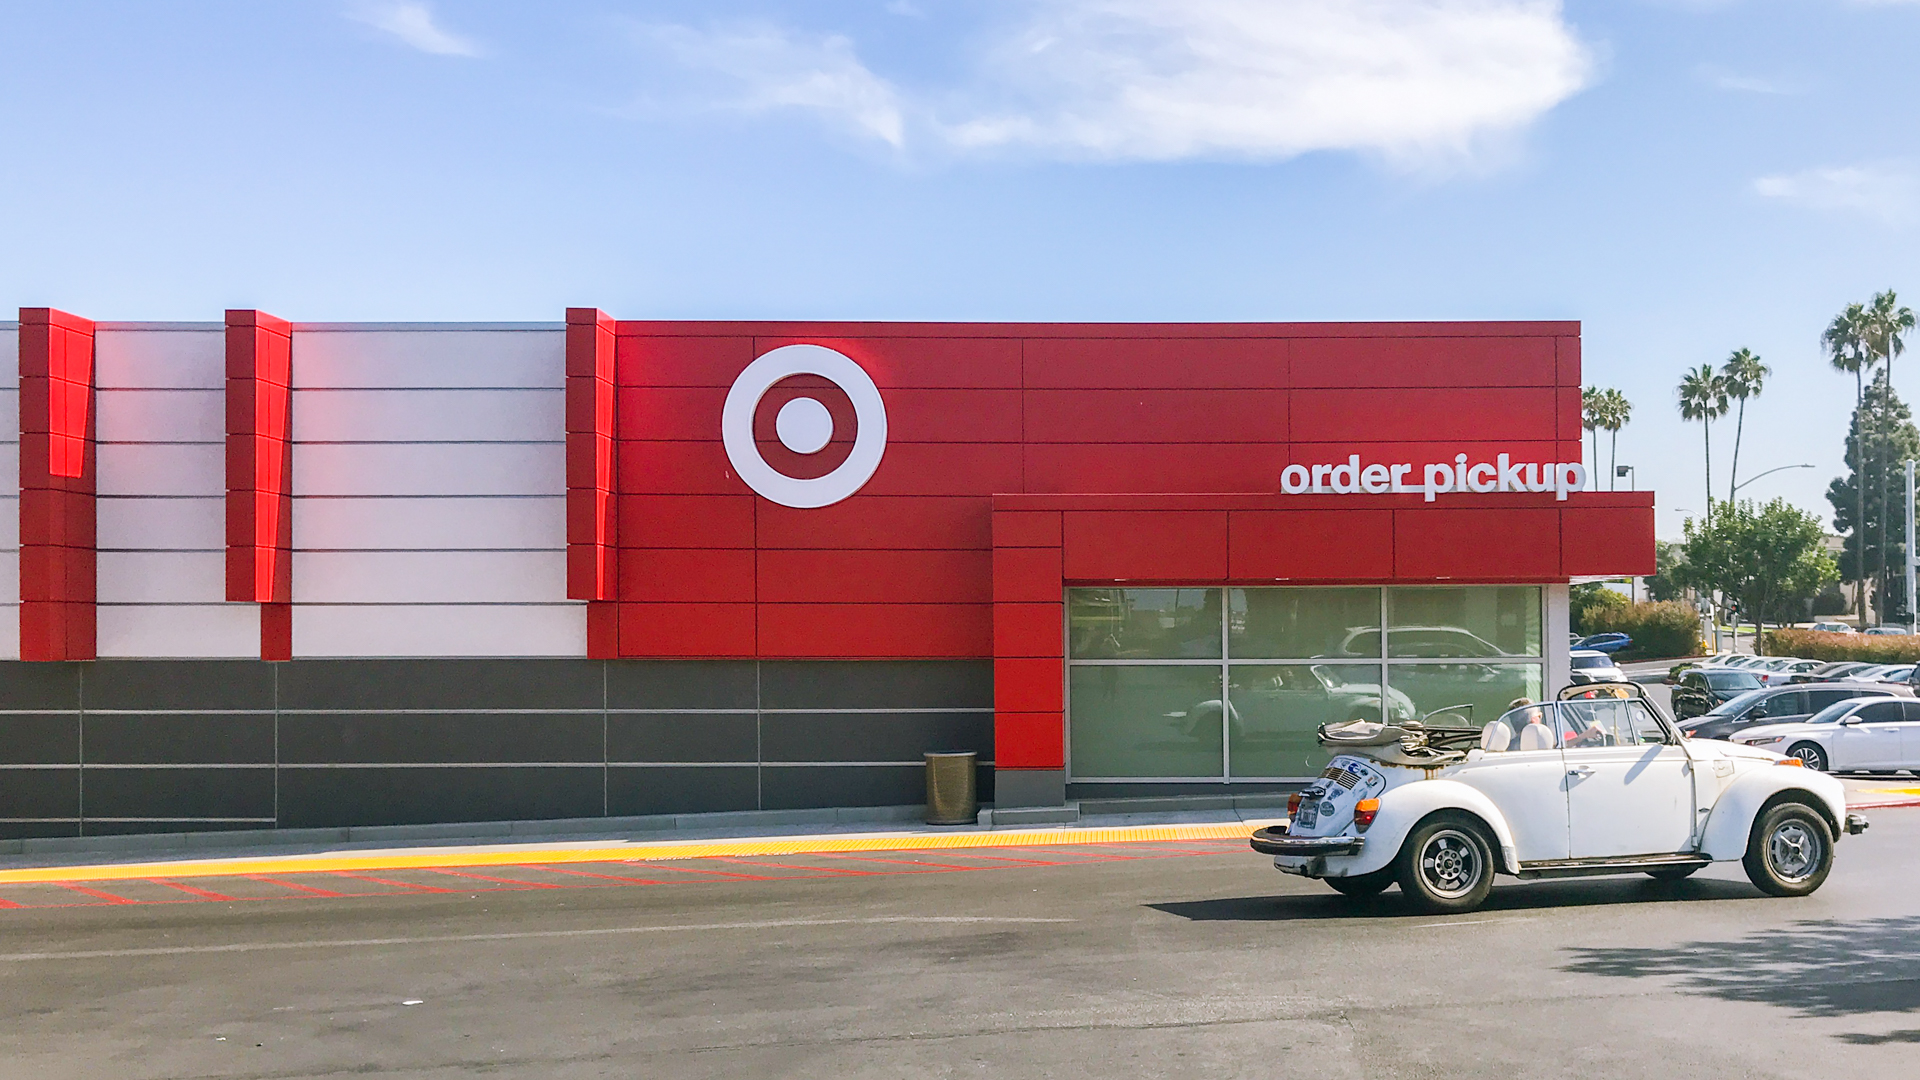 Save Hundreds With Target's Black Friday Deals